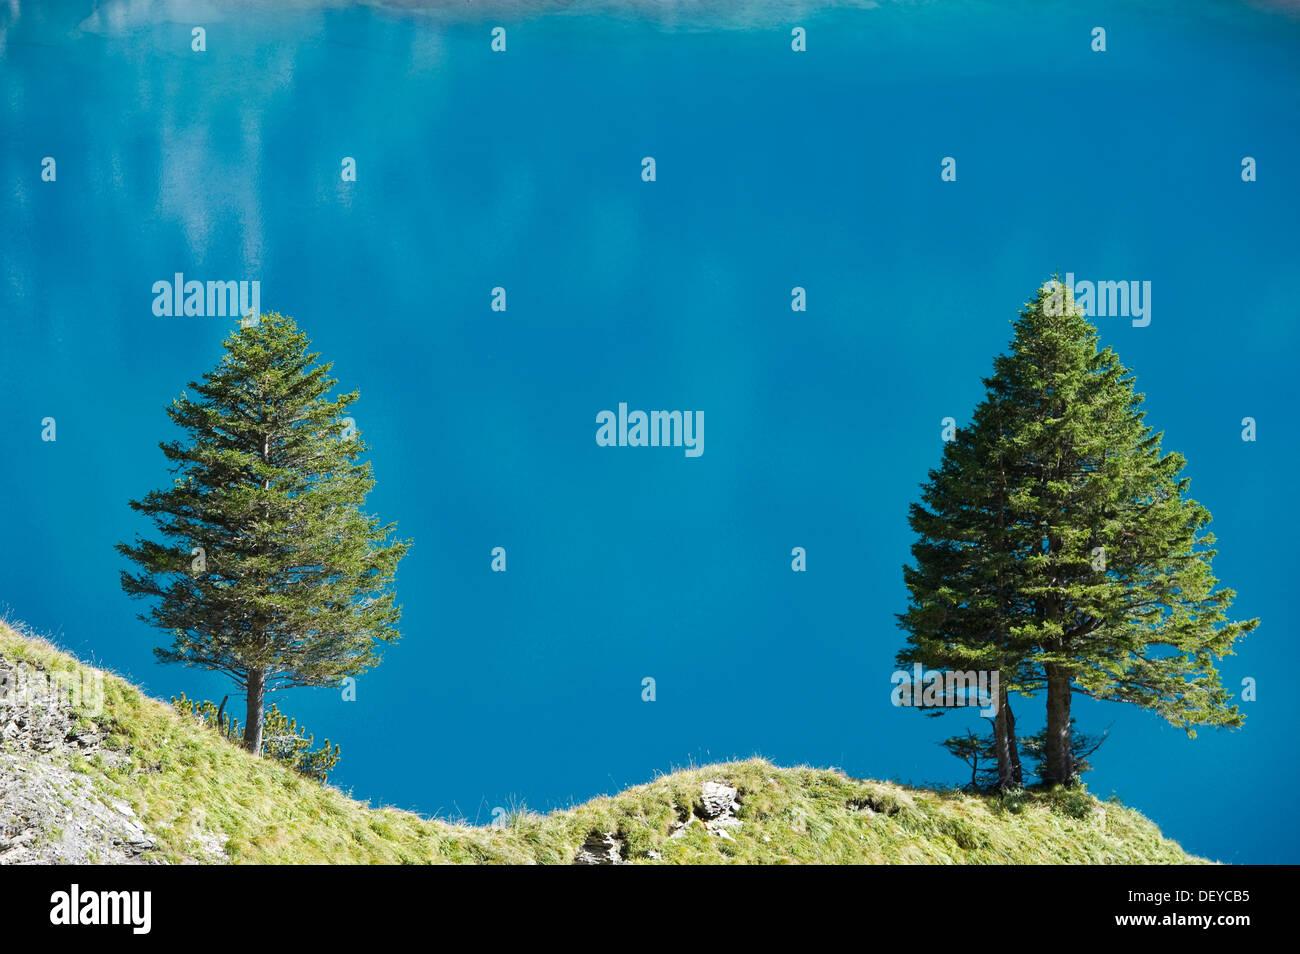 Oeschinensee, Oeschinen Lake, Bernese Oberland, Canton of Bern, Switzerland, Europe - Stock Image